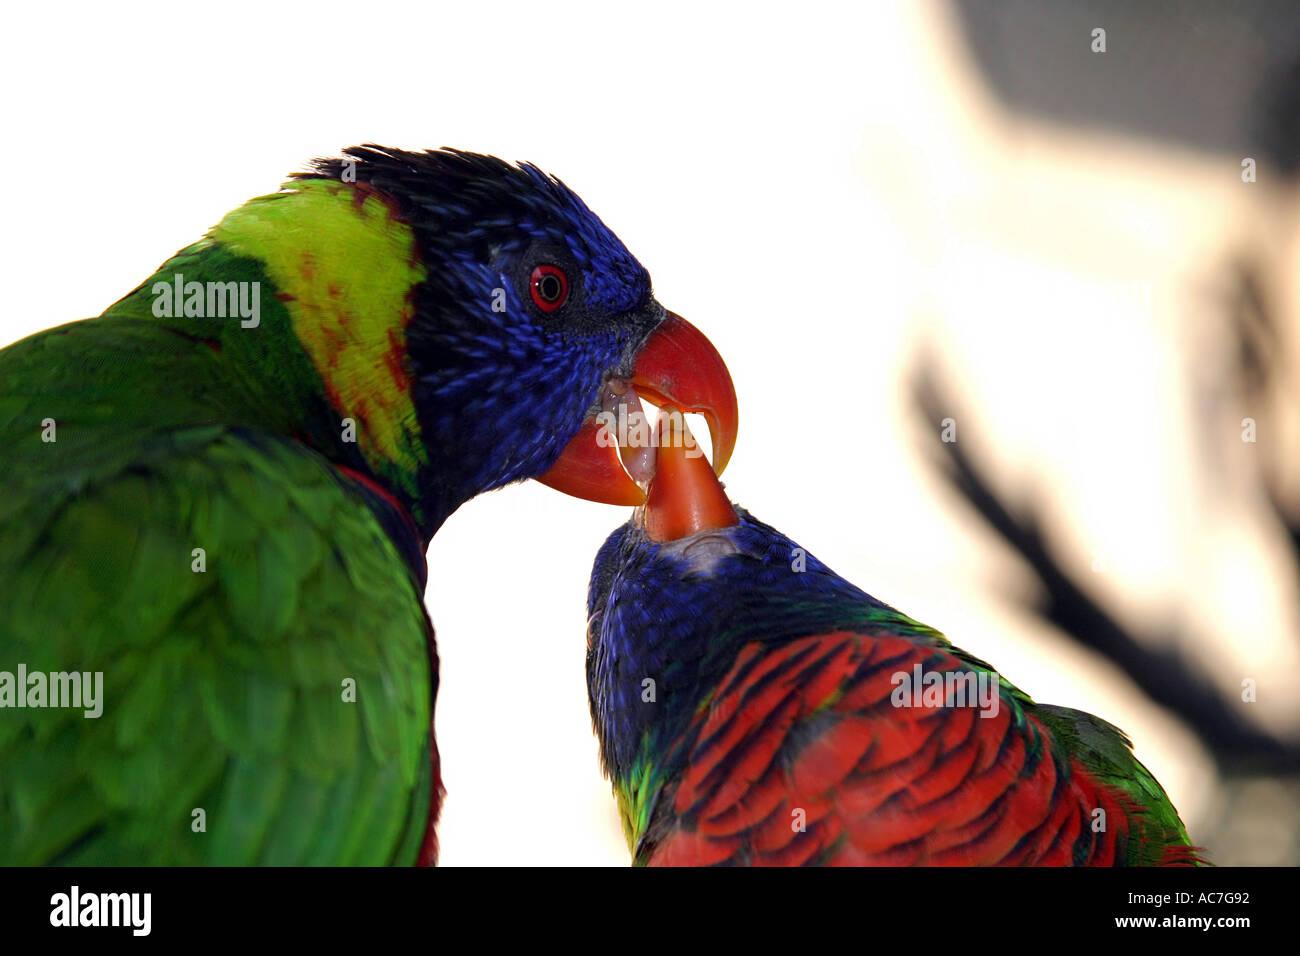 Parrots feeding each other